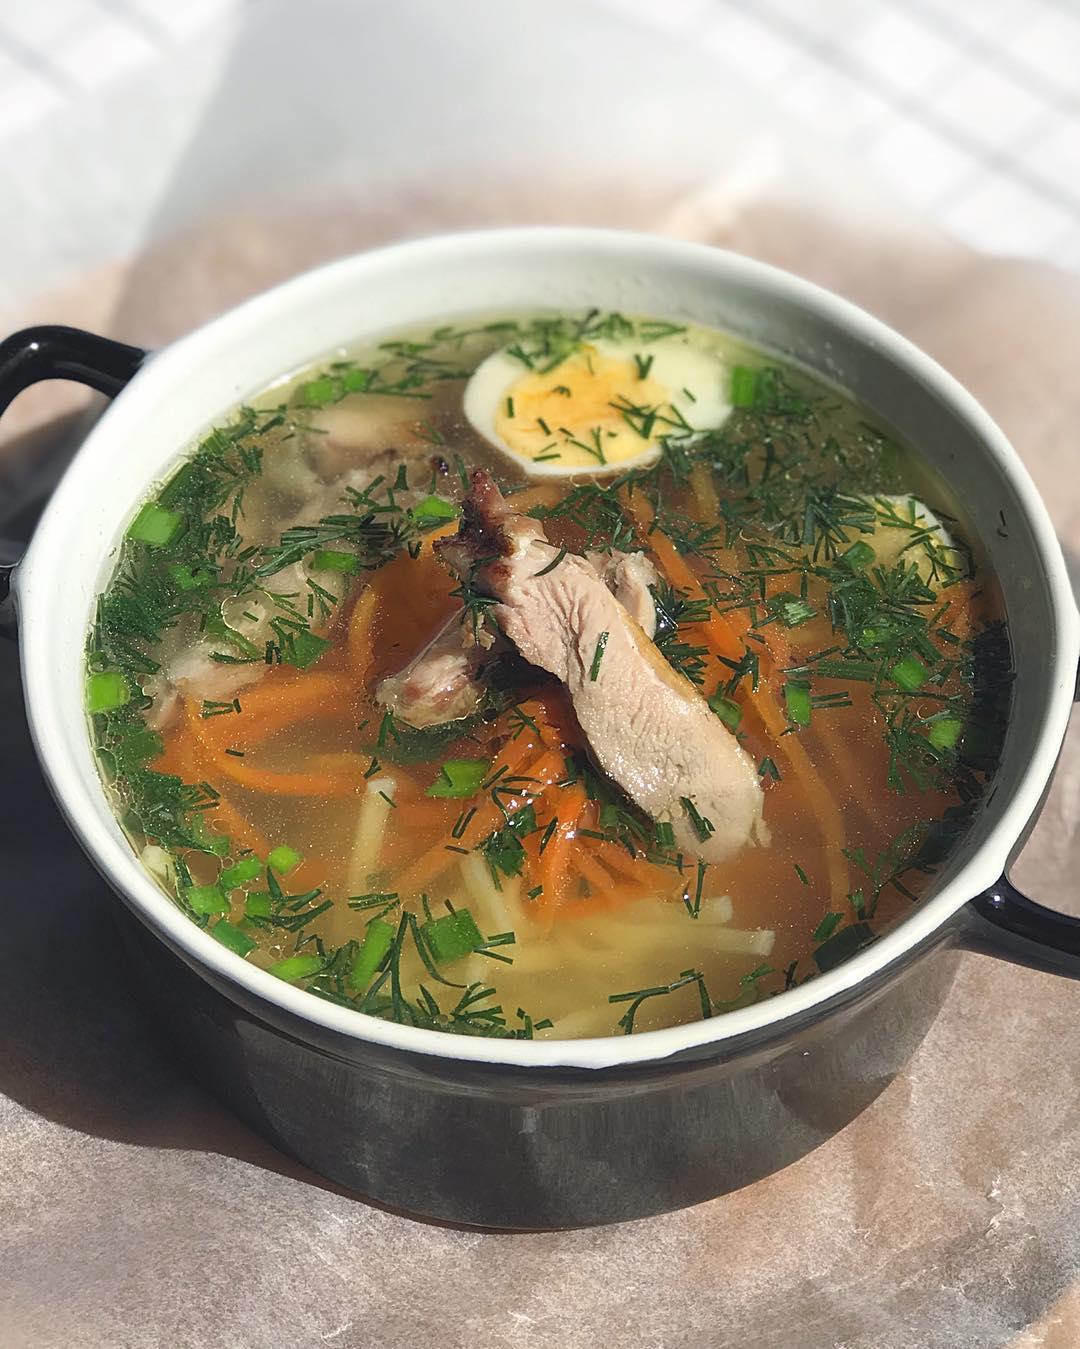 суп из перепелов рецепт с фото зеркалки